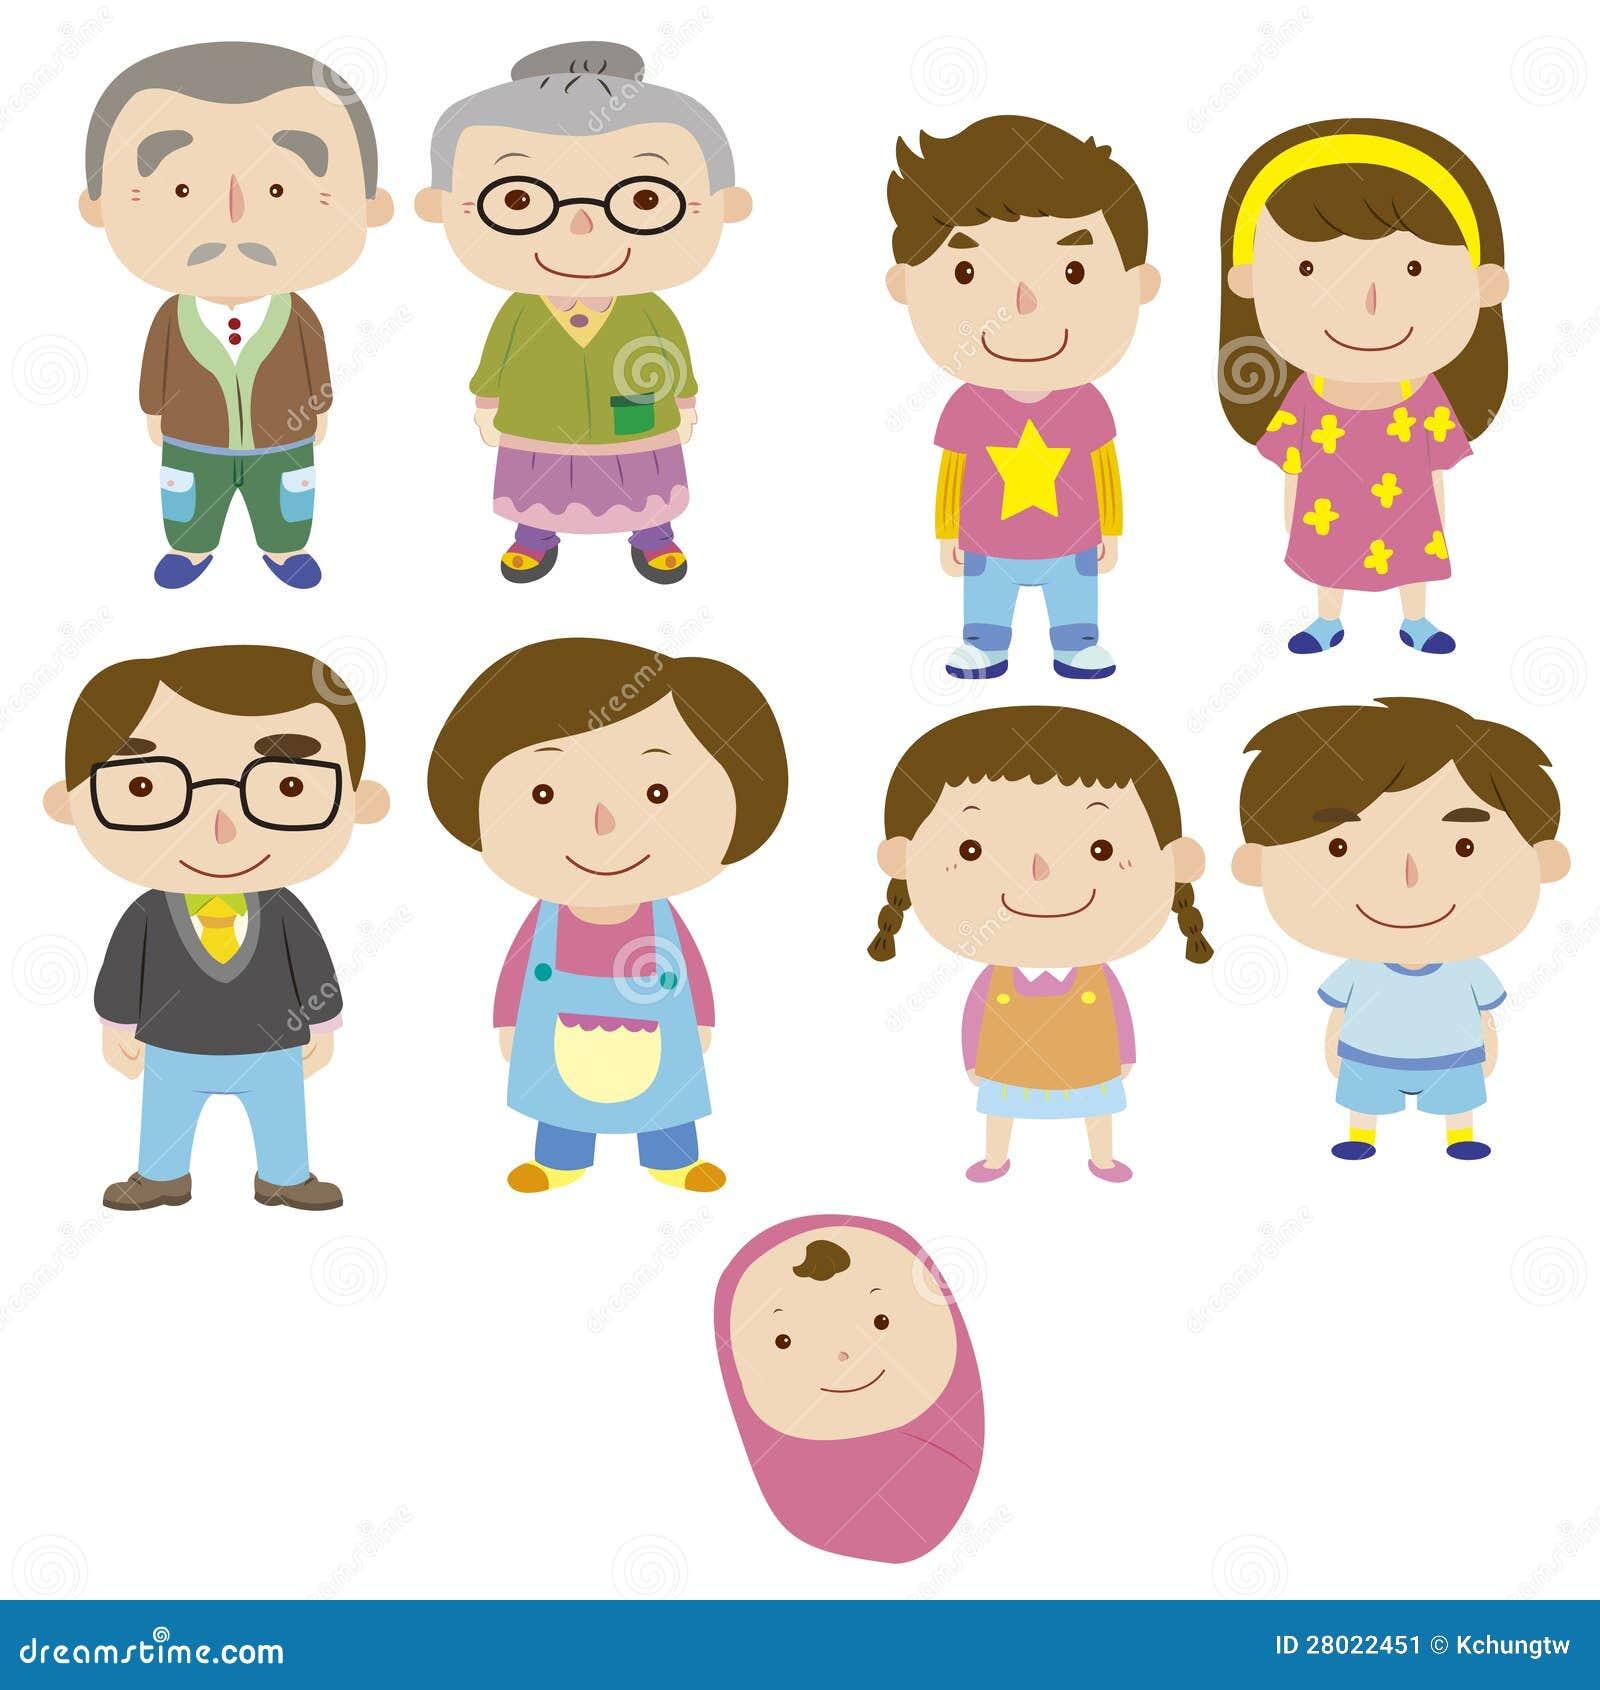 Draw A House Plan Cartoon Family Icon Stock Image Image 28022451